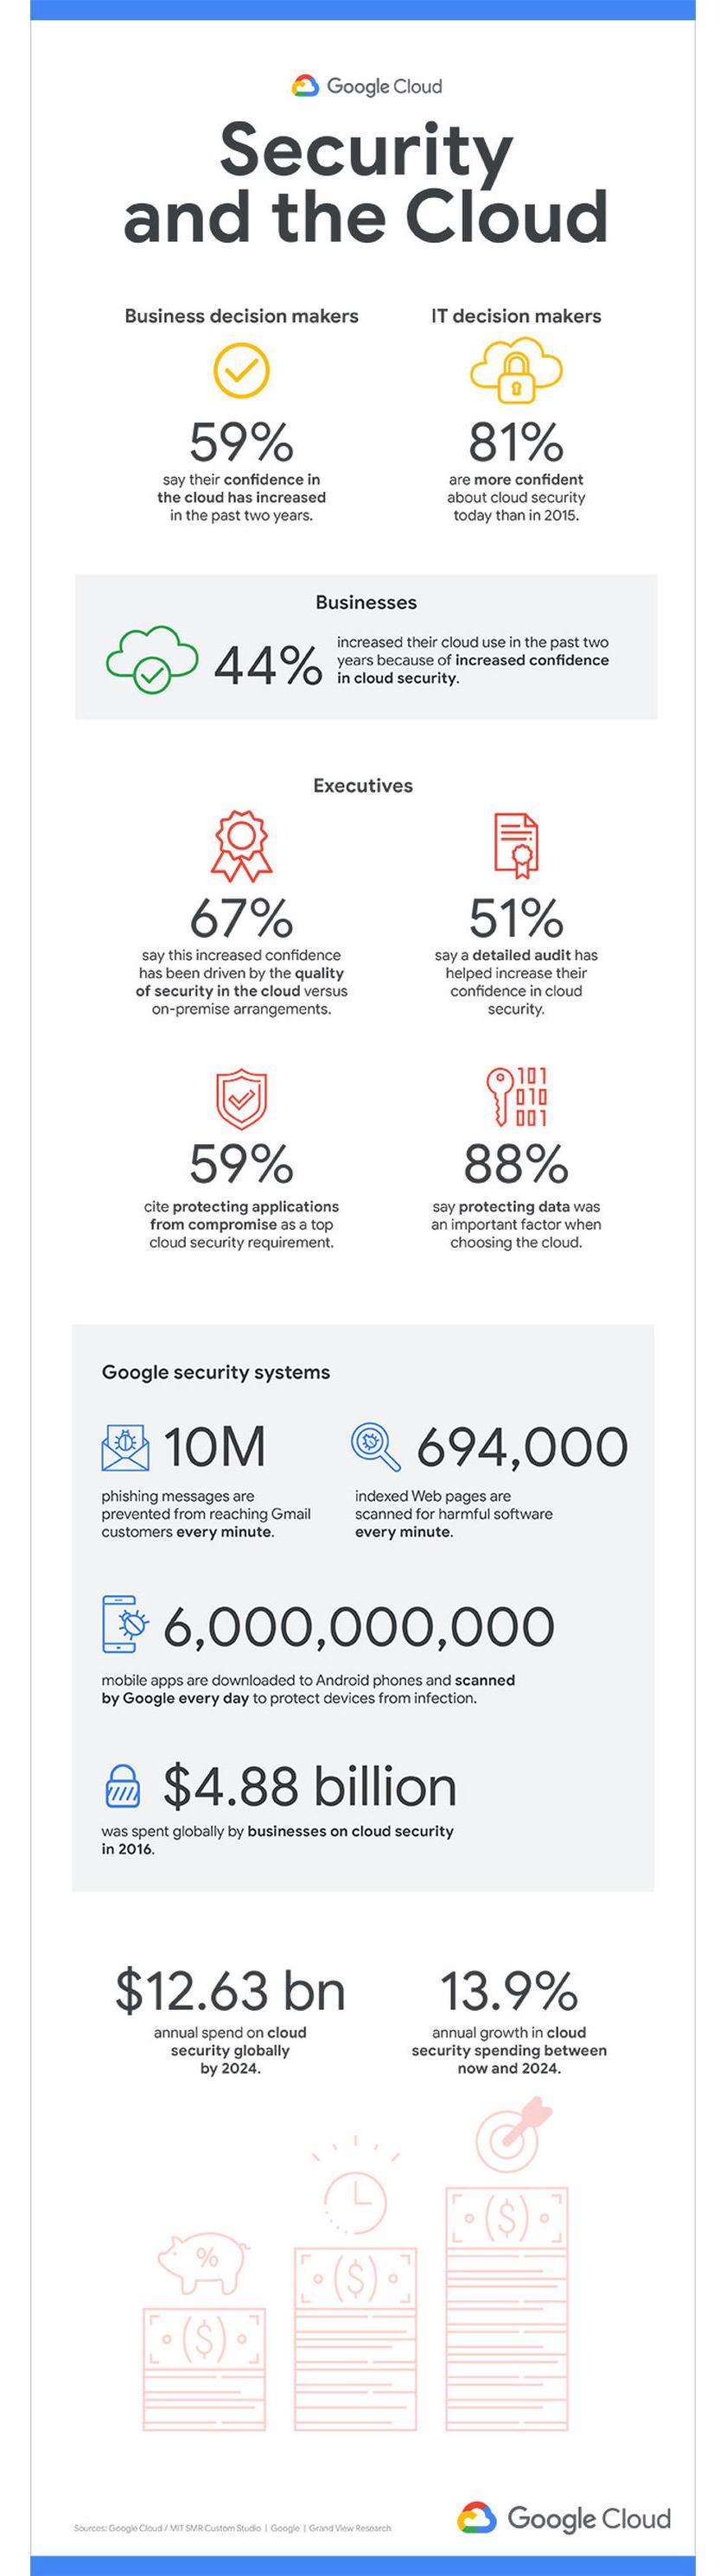 GoogleCloud_Security_Cloud_infographic_1-2